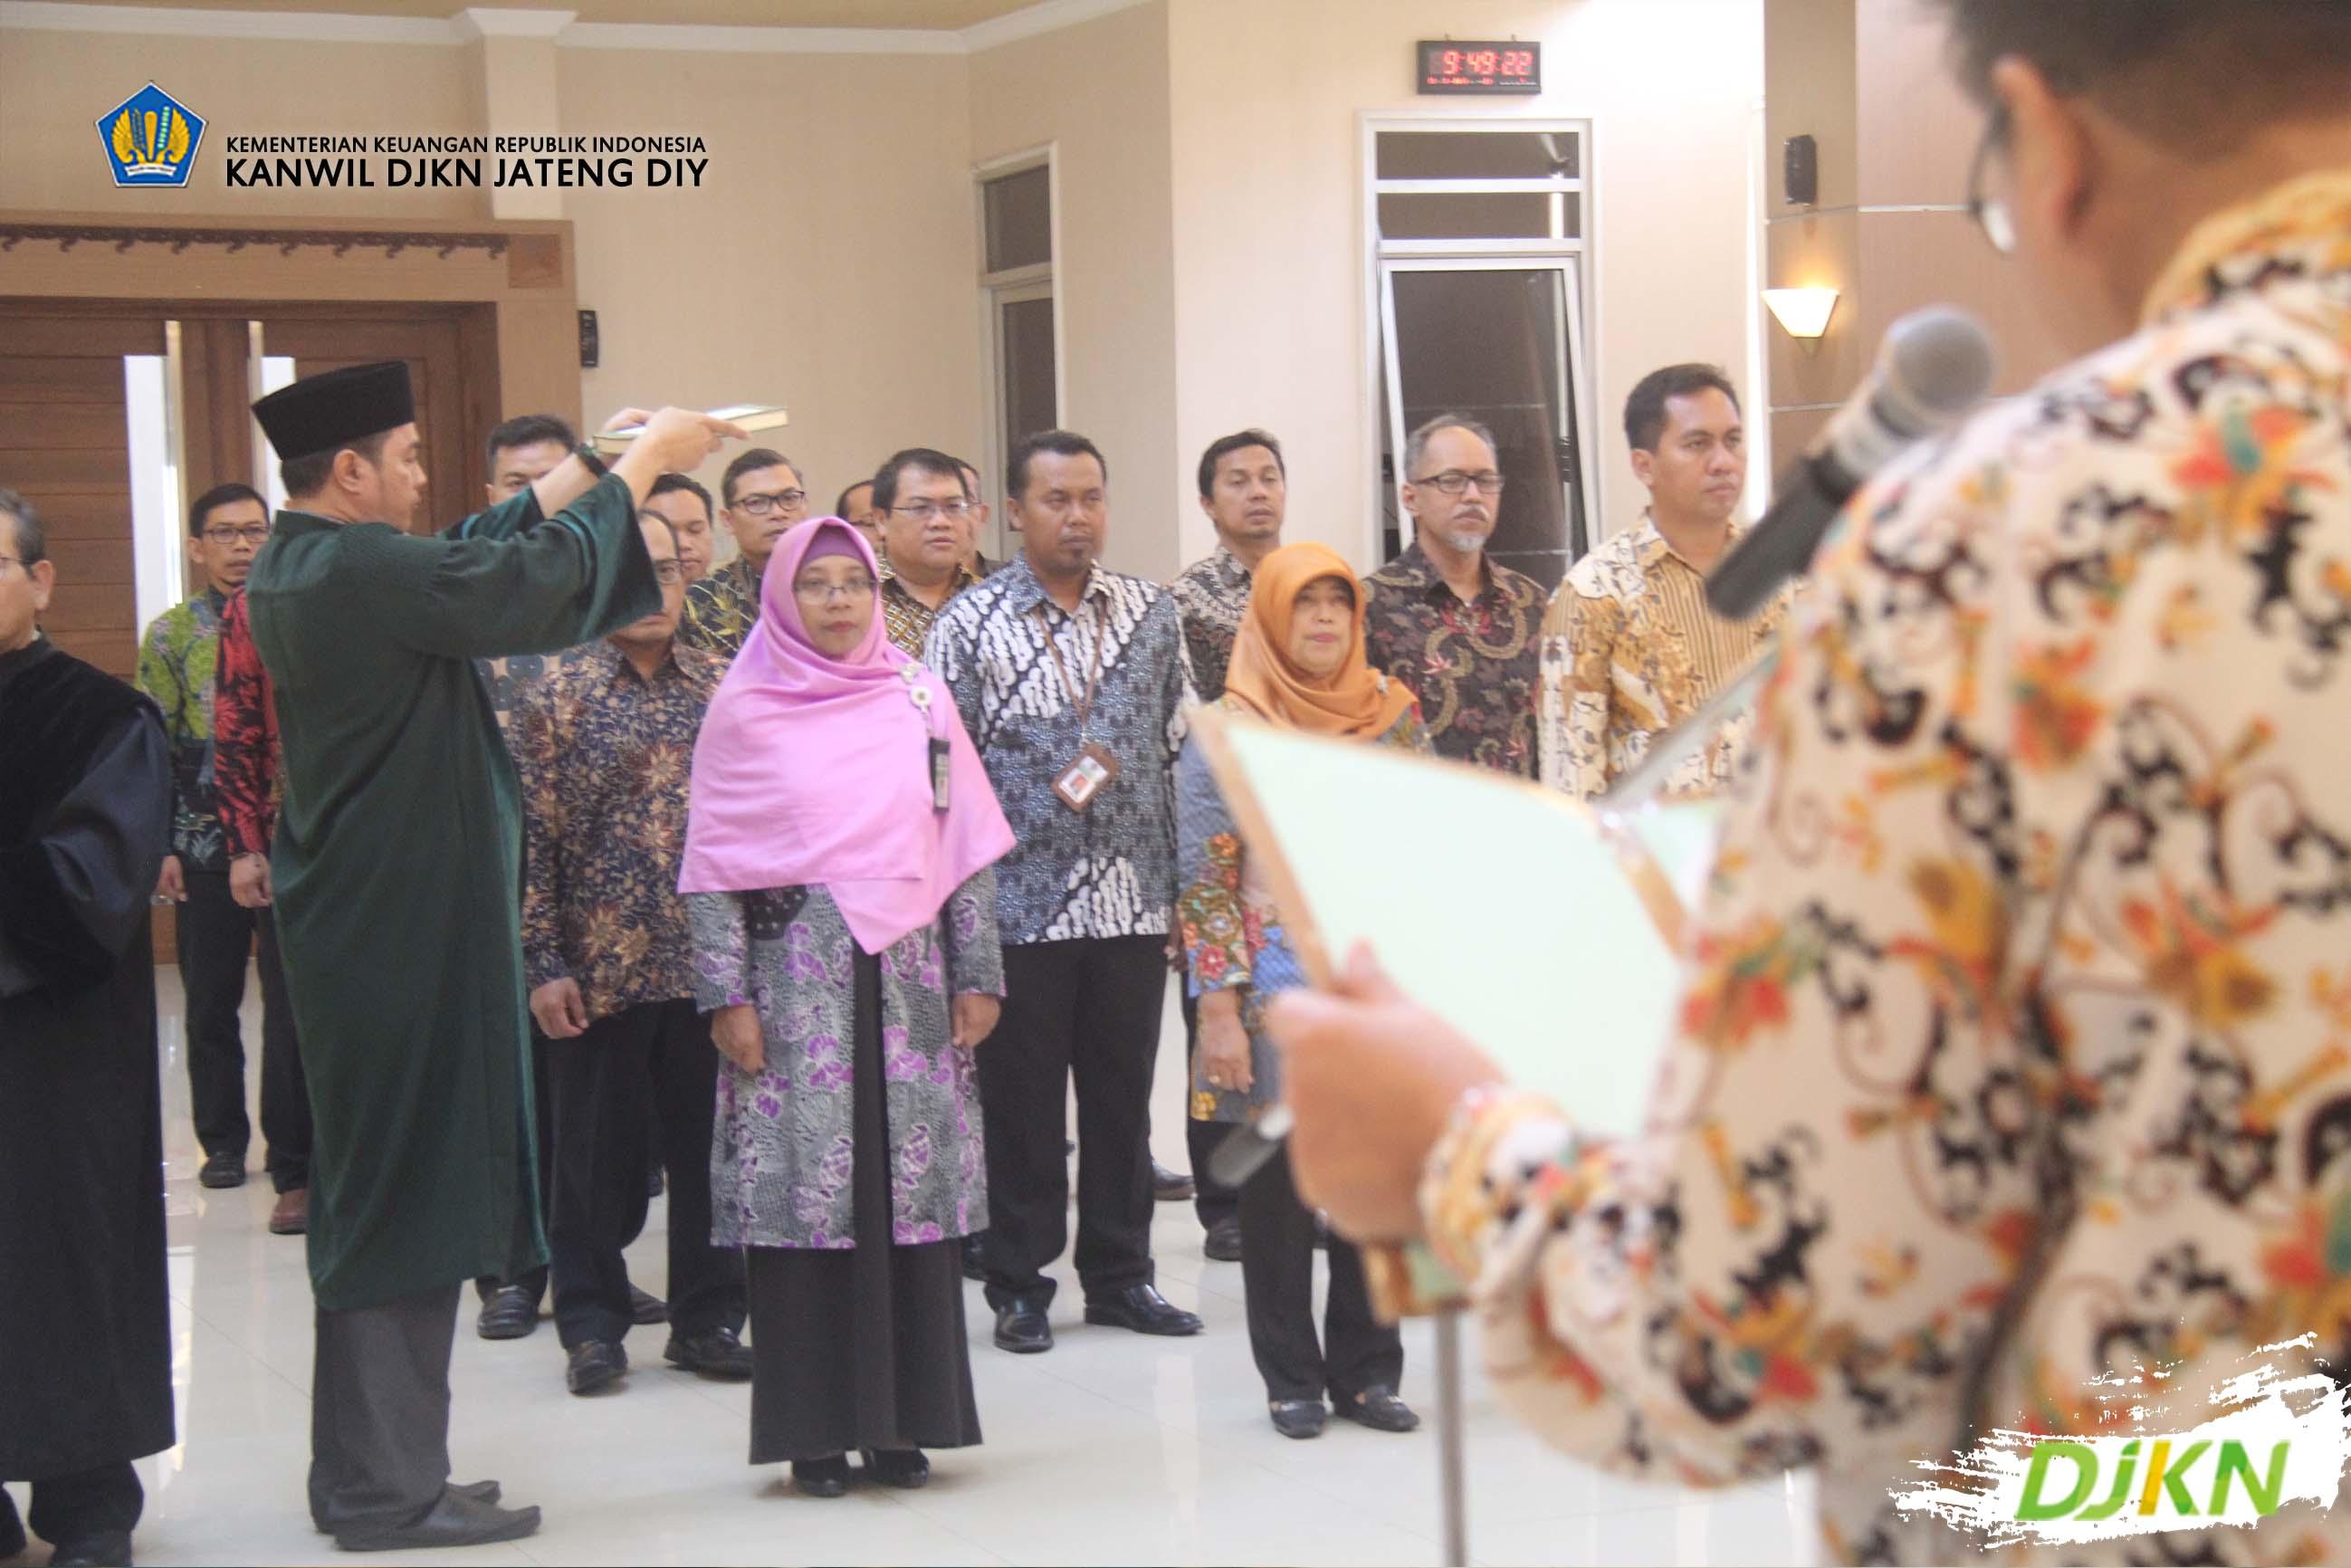 Lantik Pejabat Pengawas, KaKanwil DJKN Jateng DIY Menyampaikan Dua Pesan Penting